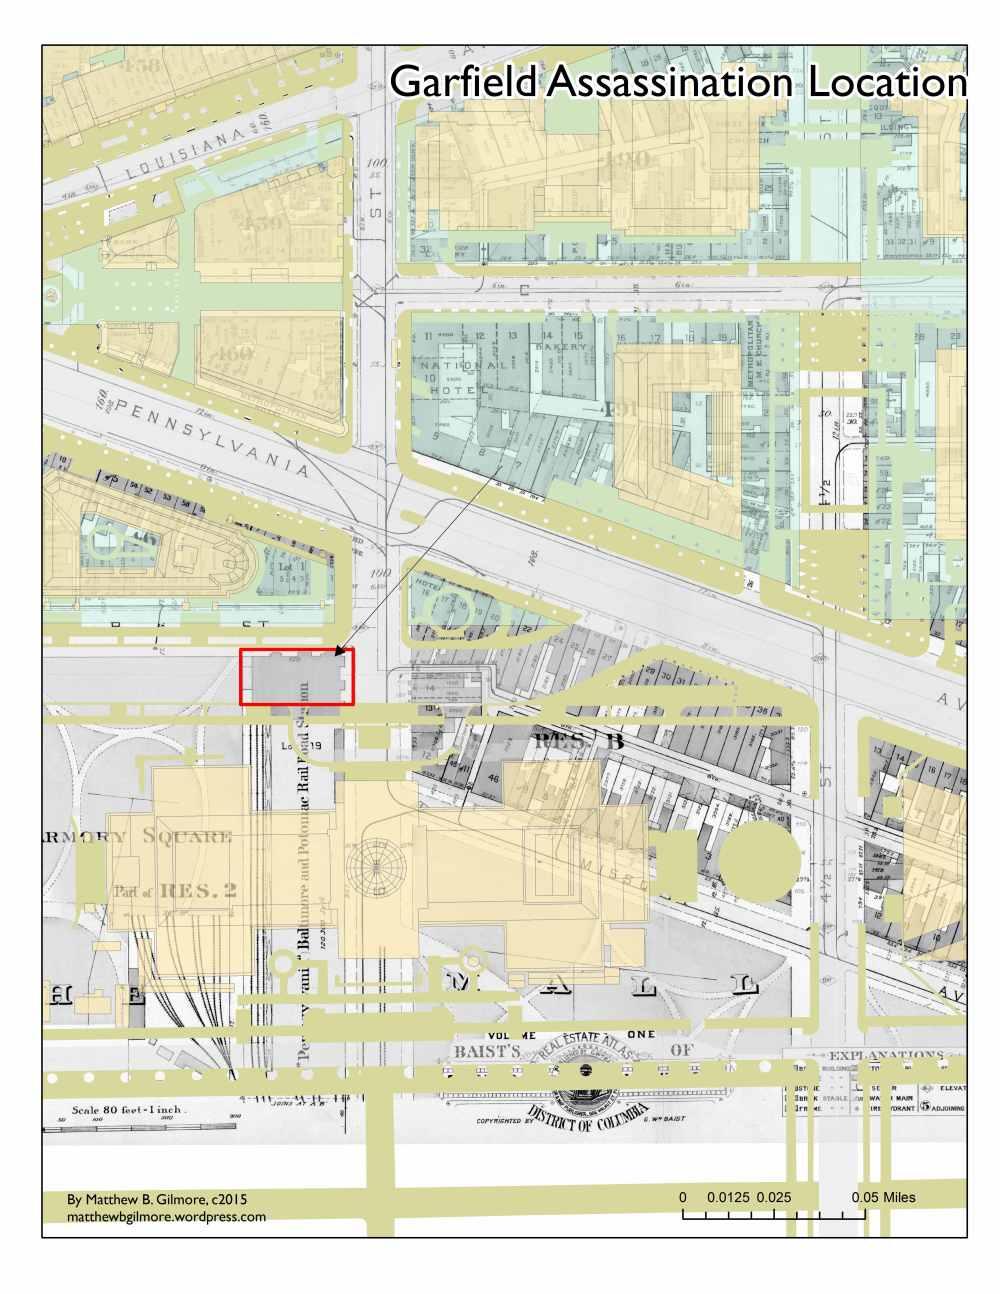 medium resolution of map indicating location of shooting of president garfield